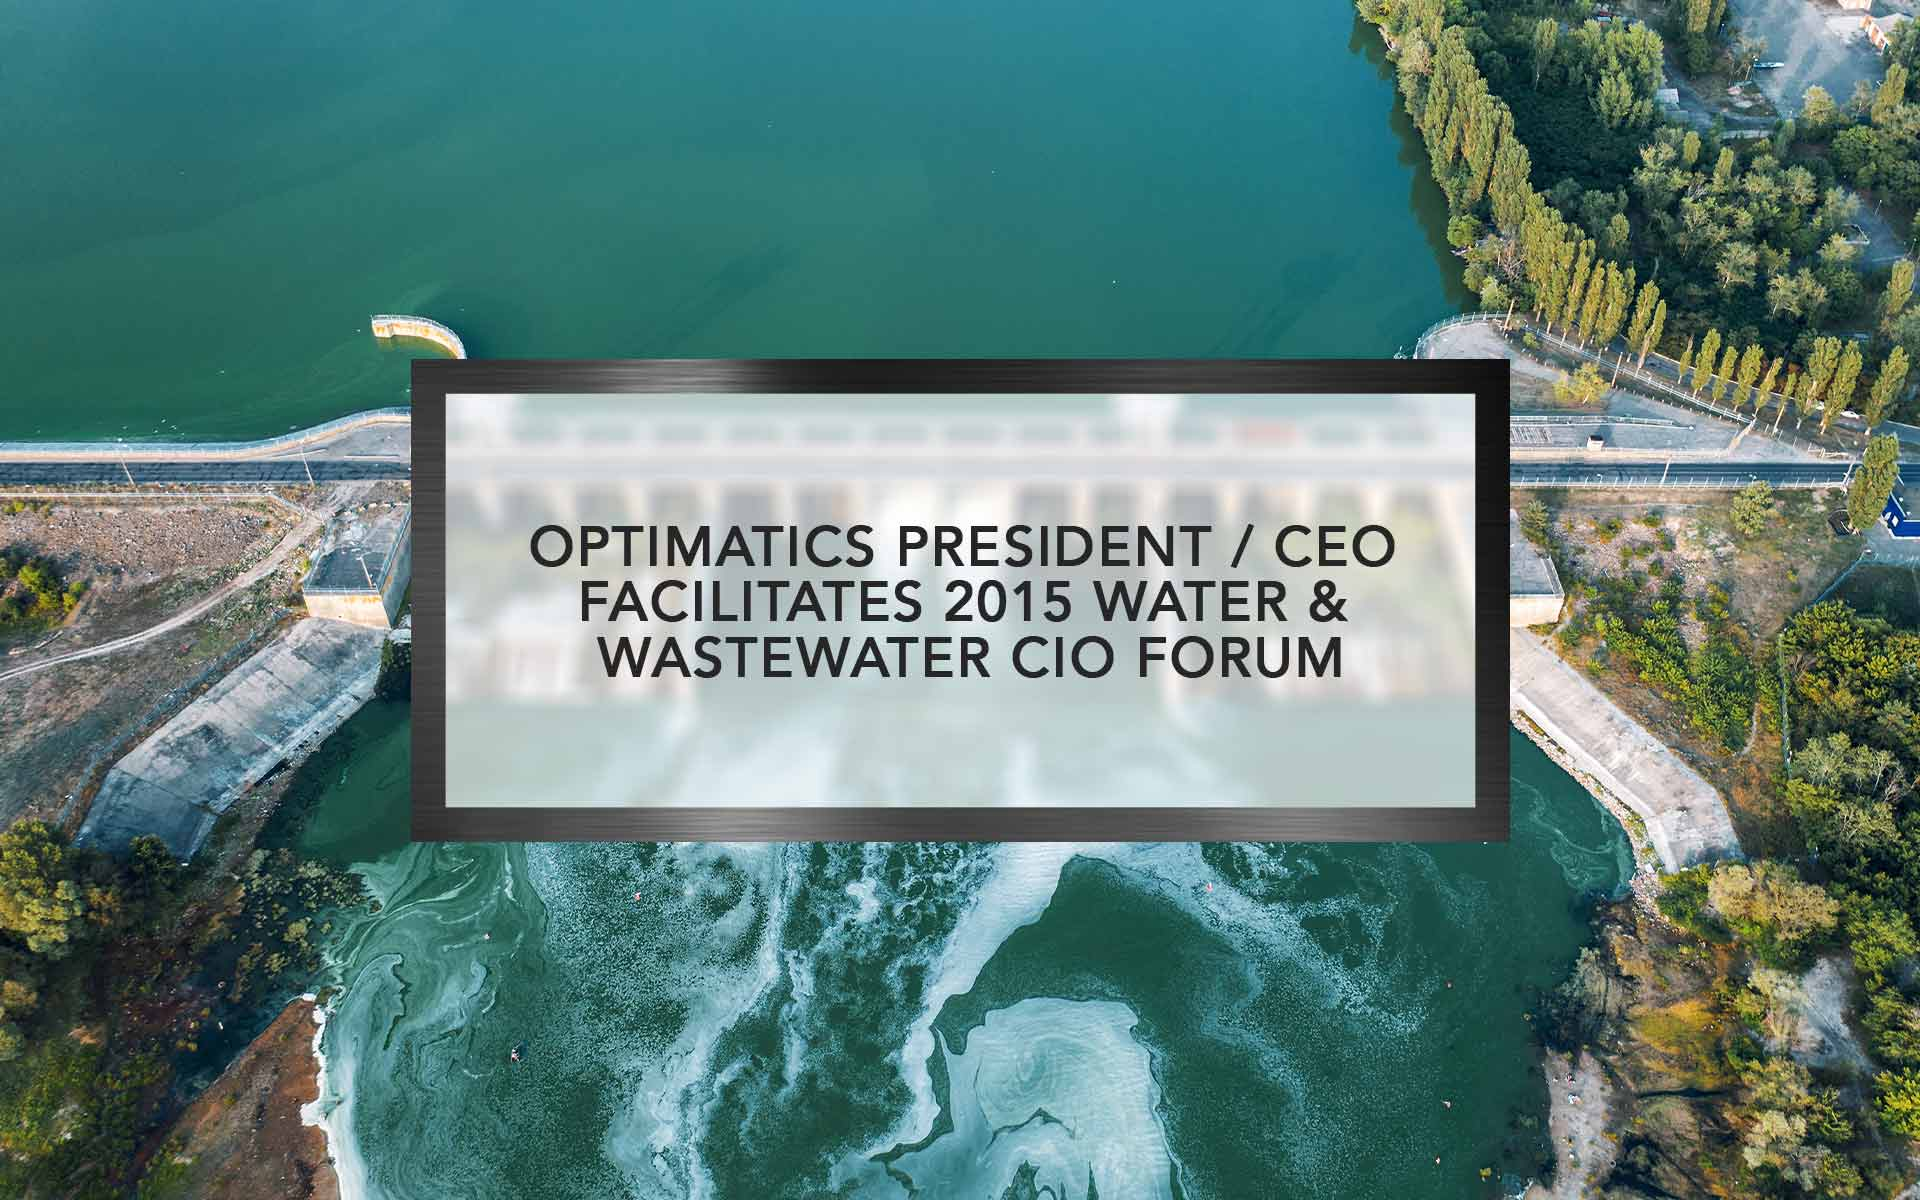 Optimatics President / CEO facilitates 2015 Water & Wastewater CIO Forum conference